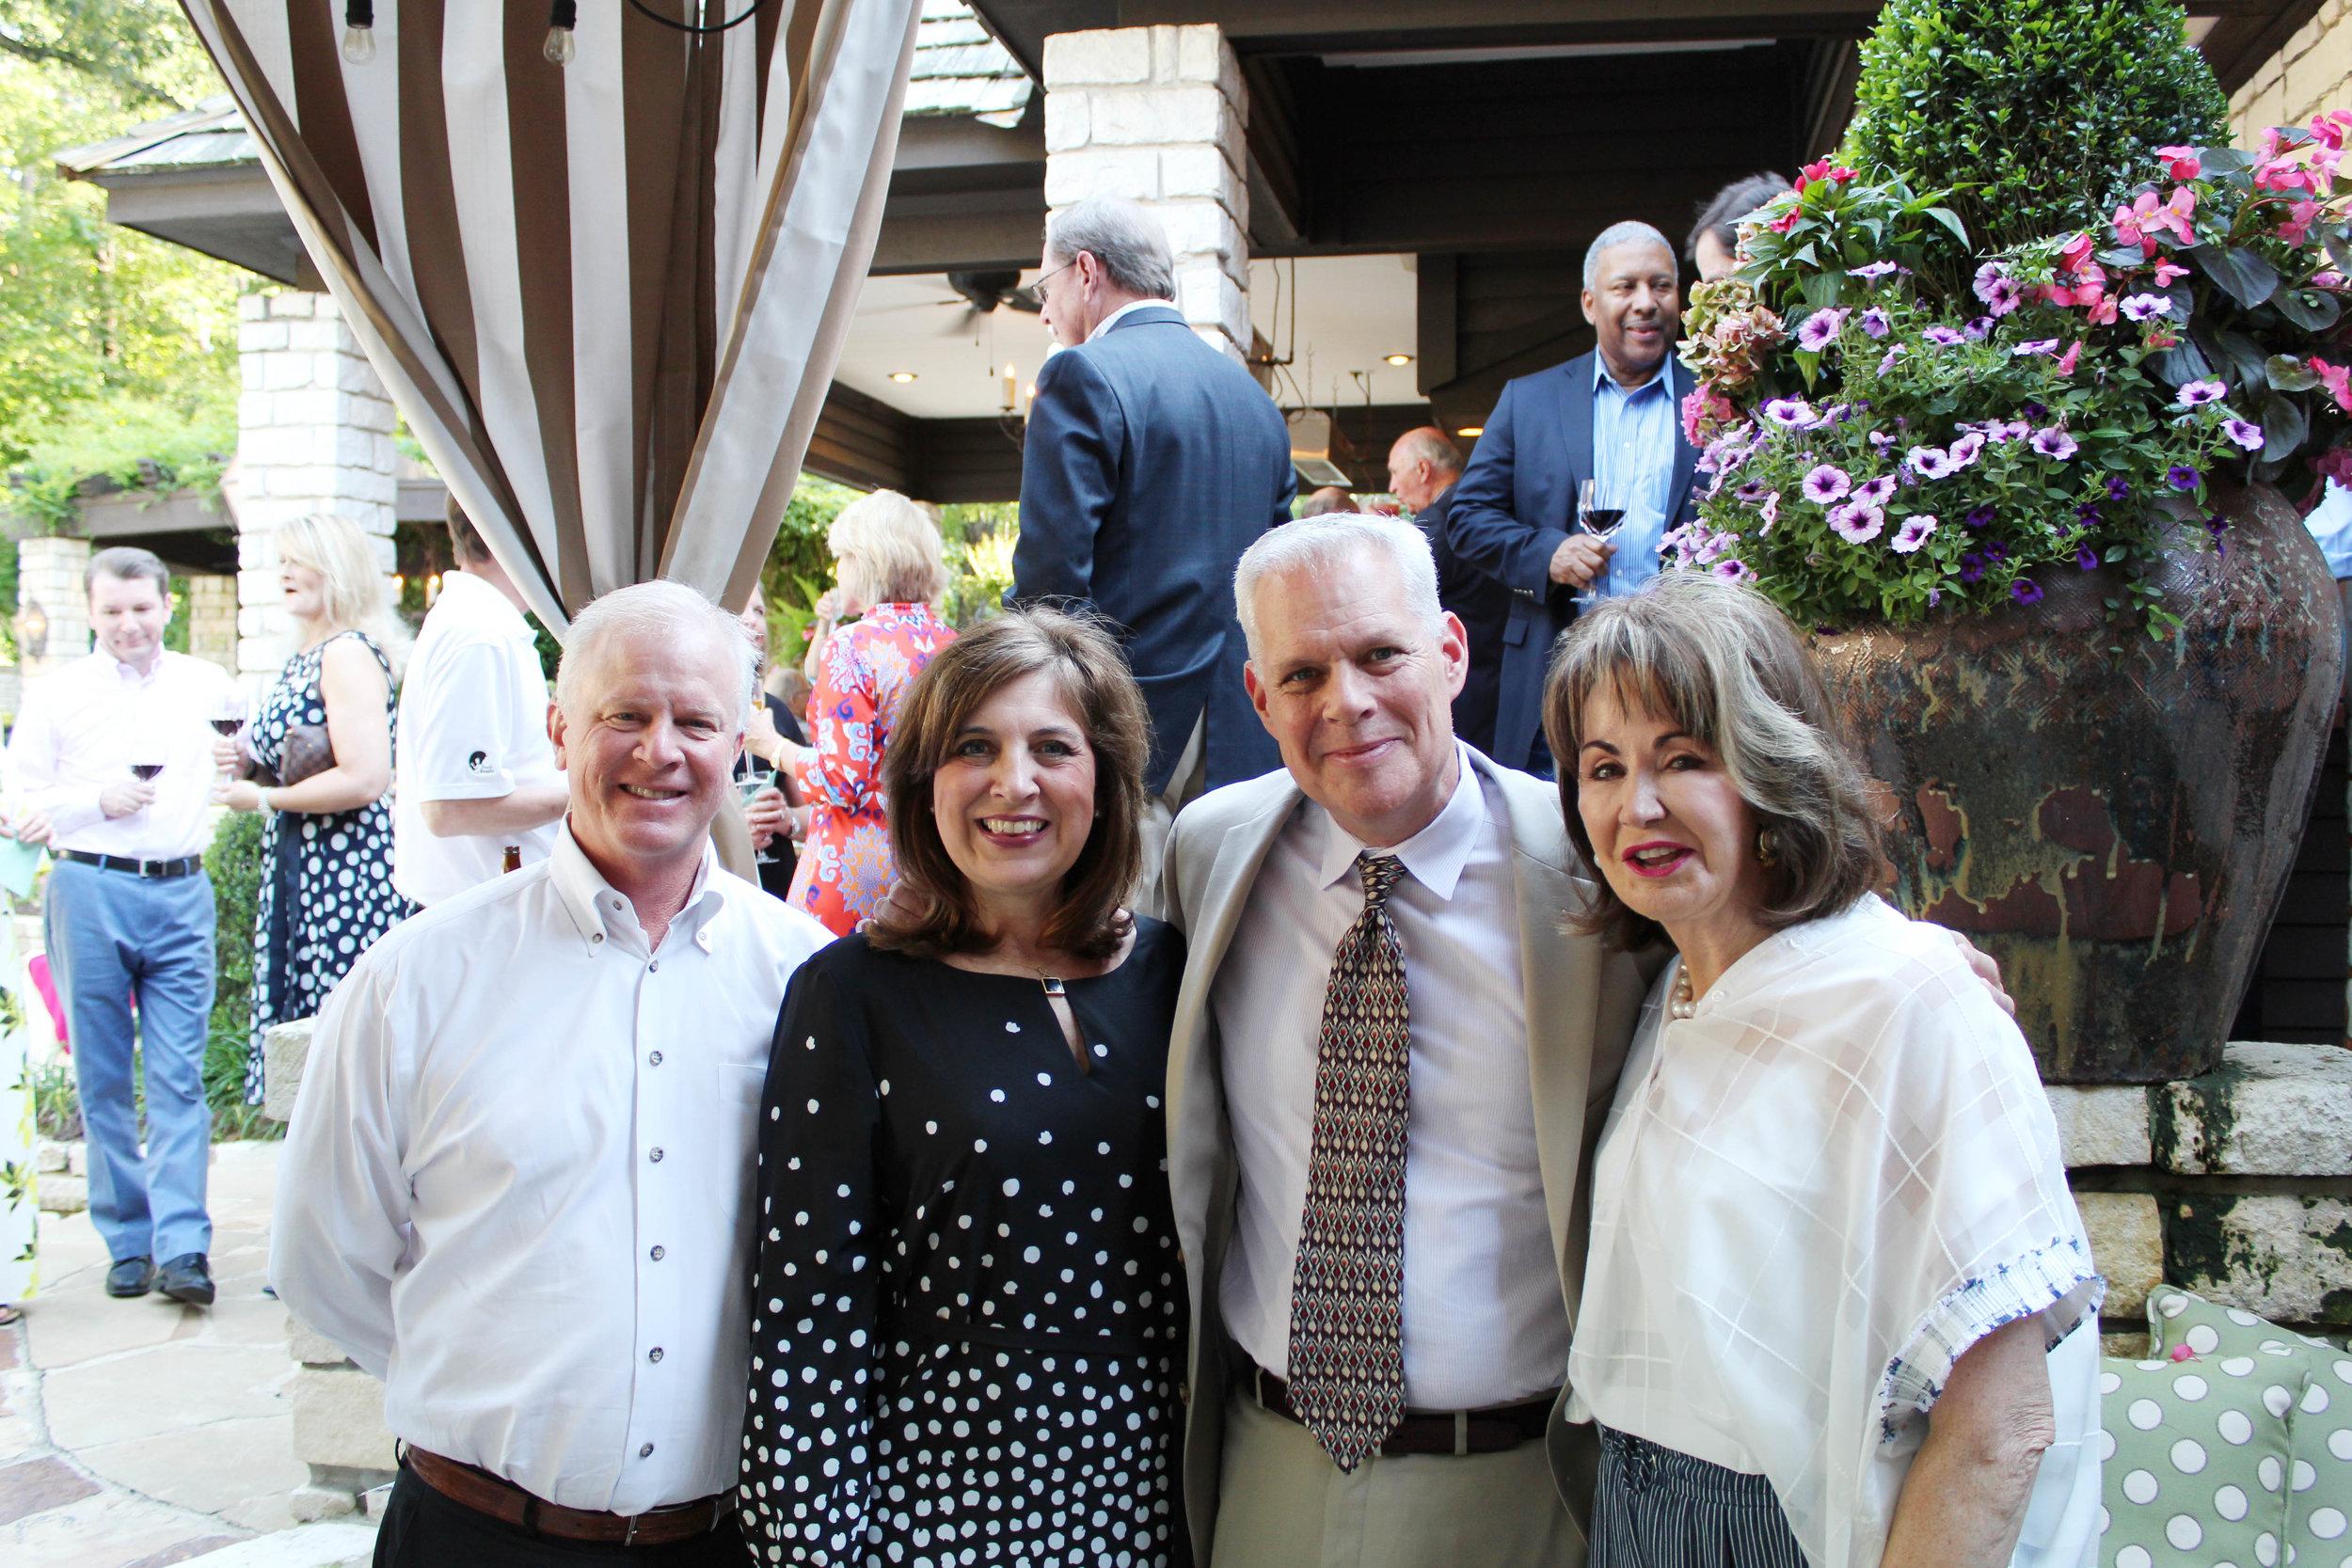 Jeff Prieskorn, Suzy and Robert Irwin and Judy Morgan